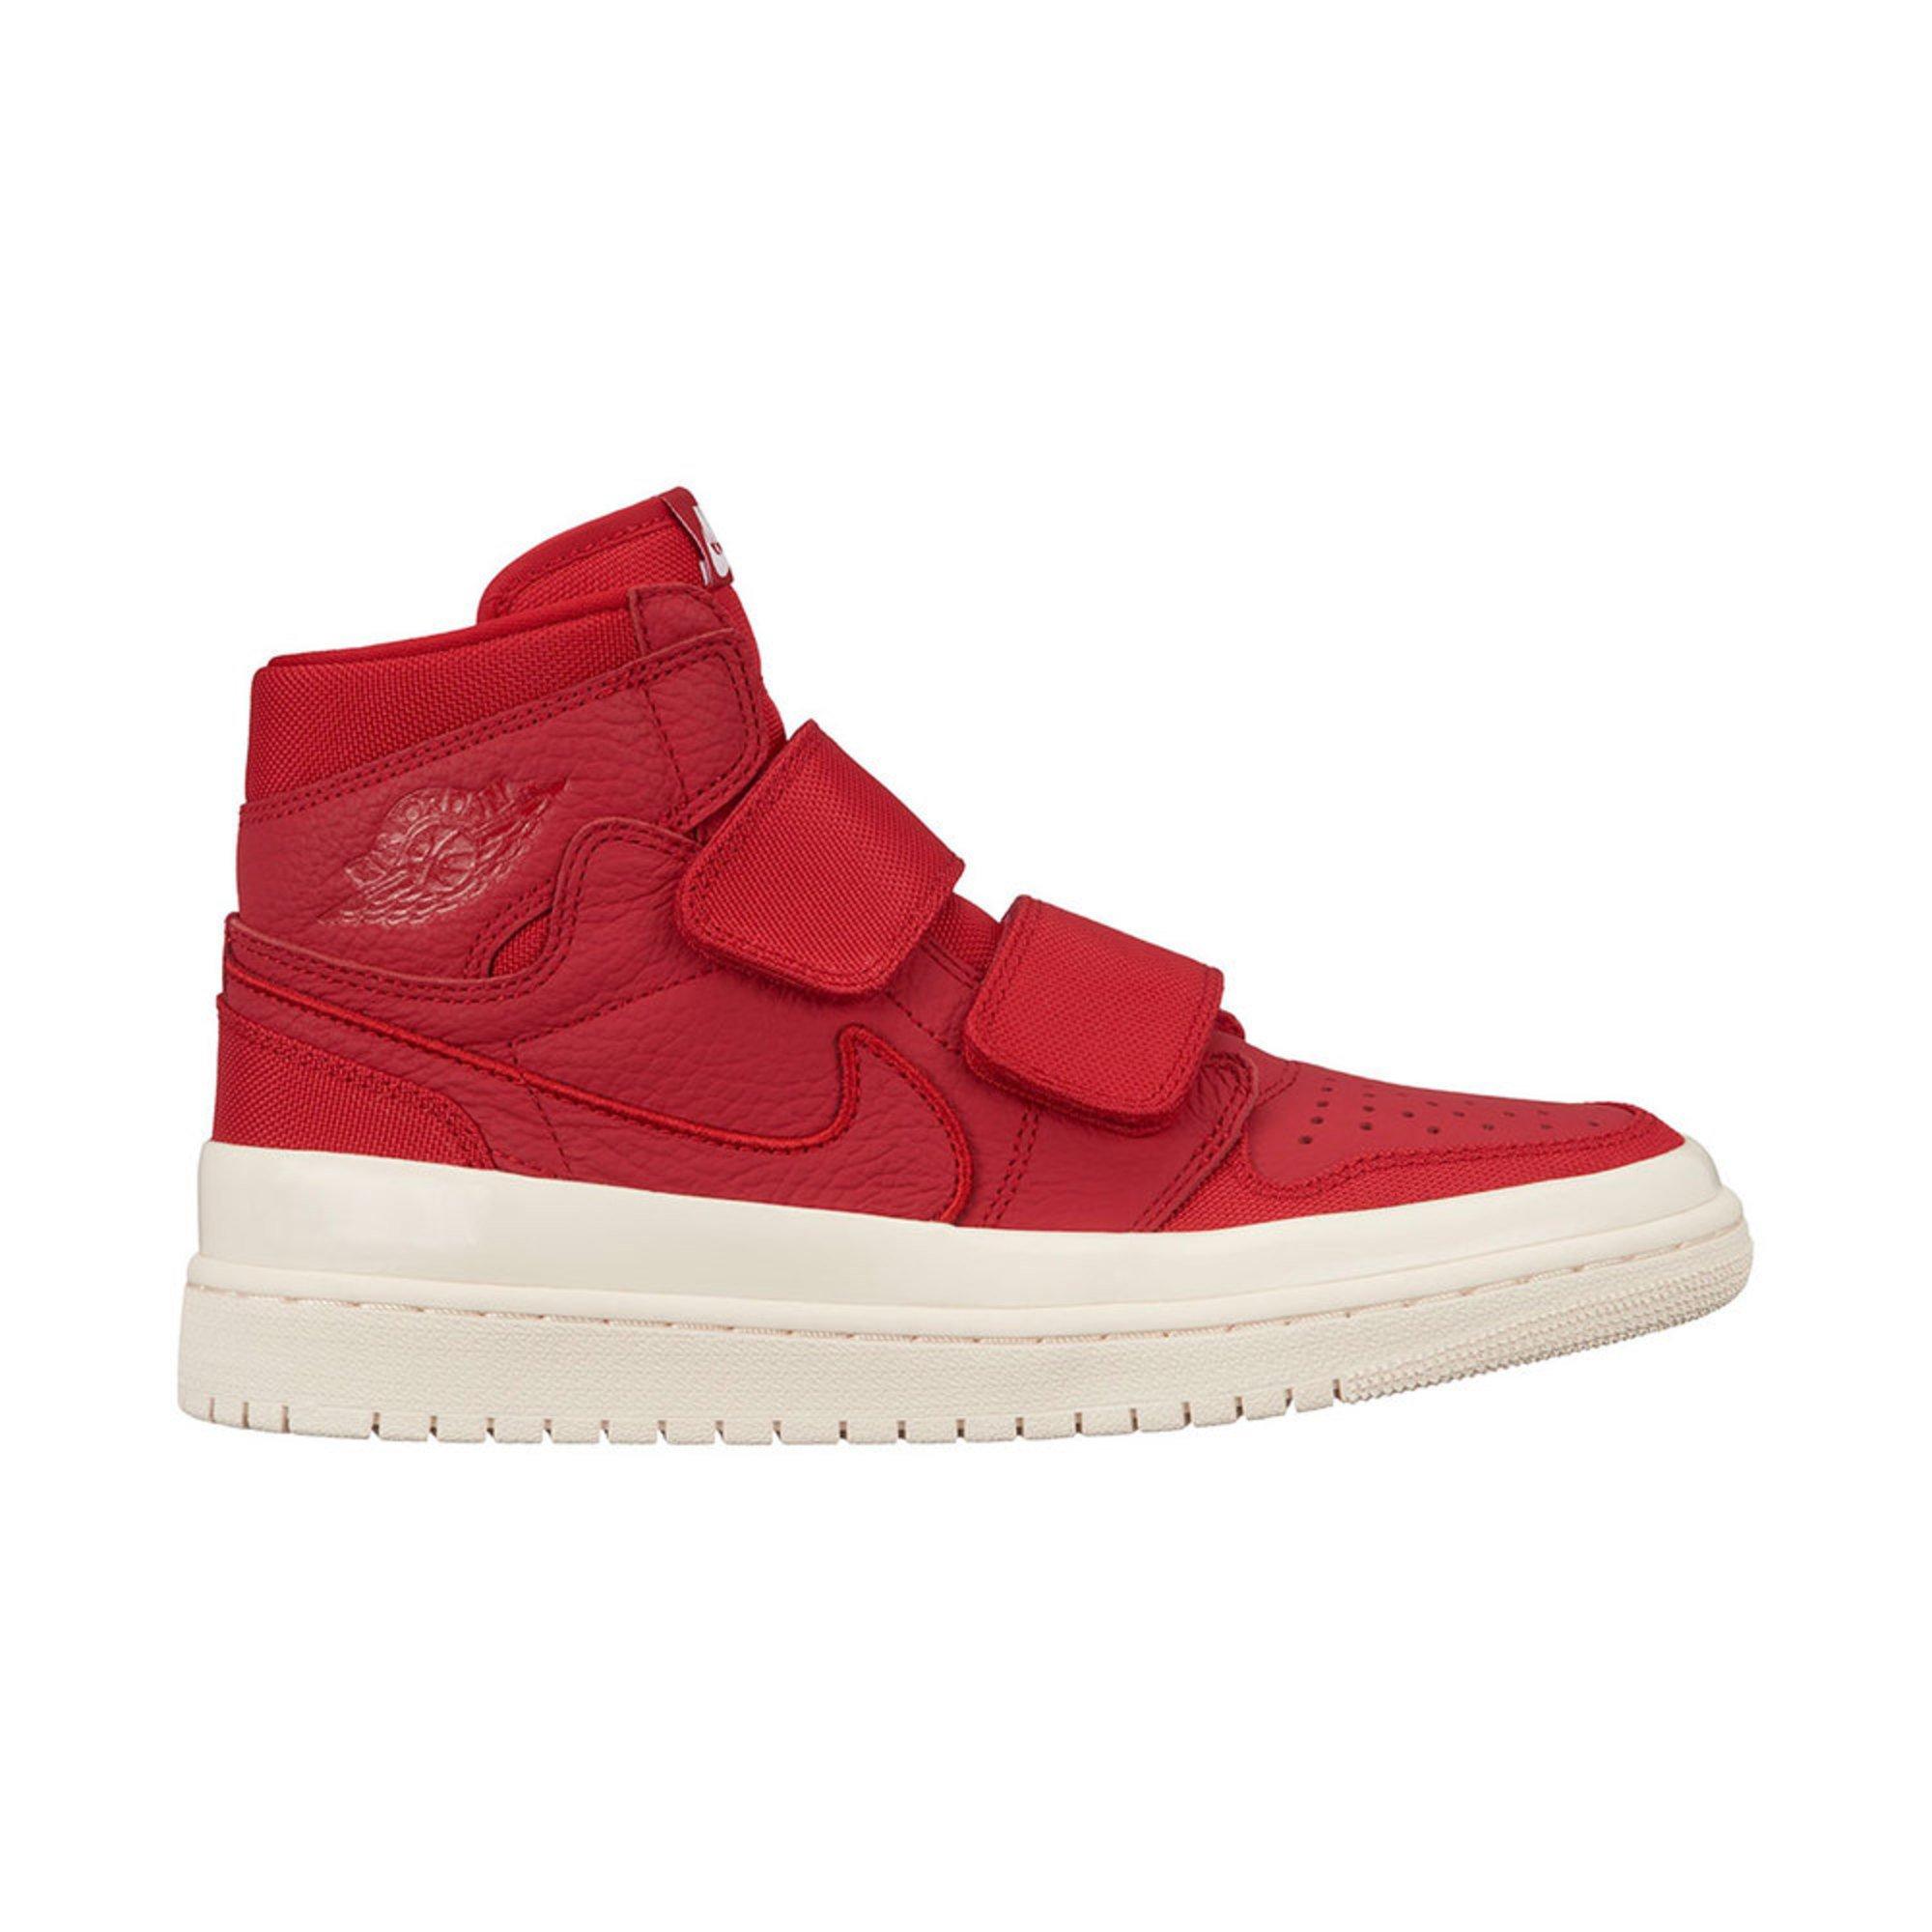 3652f965e550 Jordan. Jordan Men s Air Jordan 1 RE Hi Double Strap Basketball Shoe